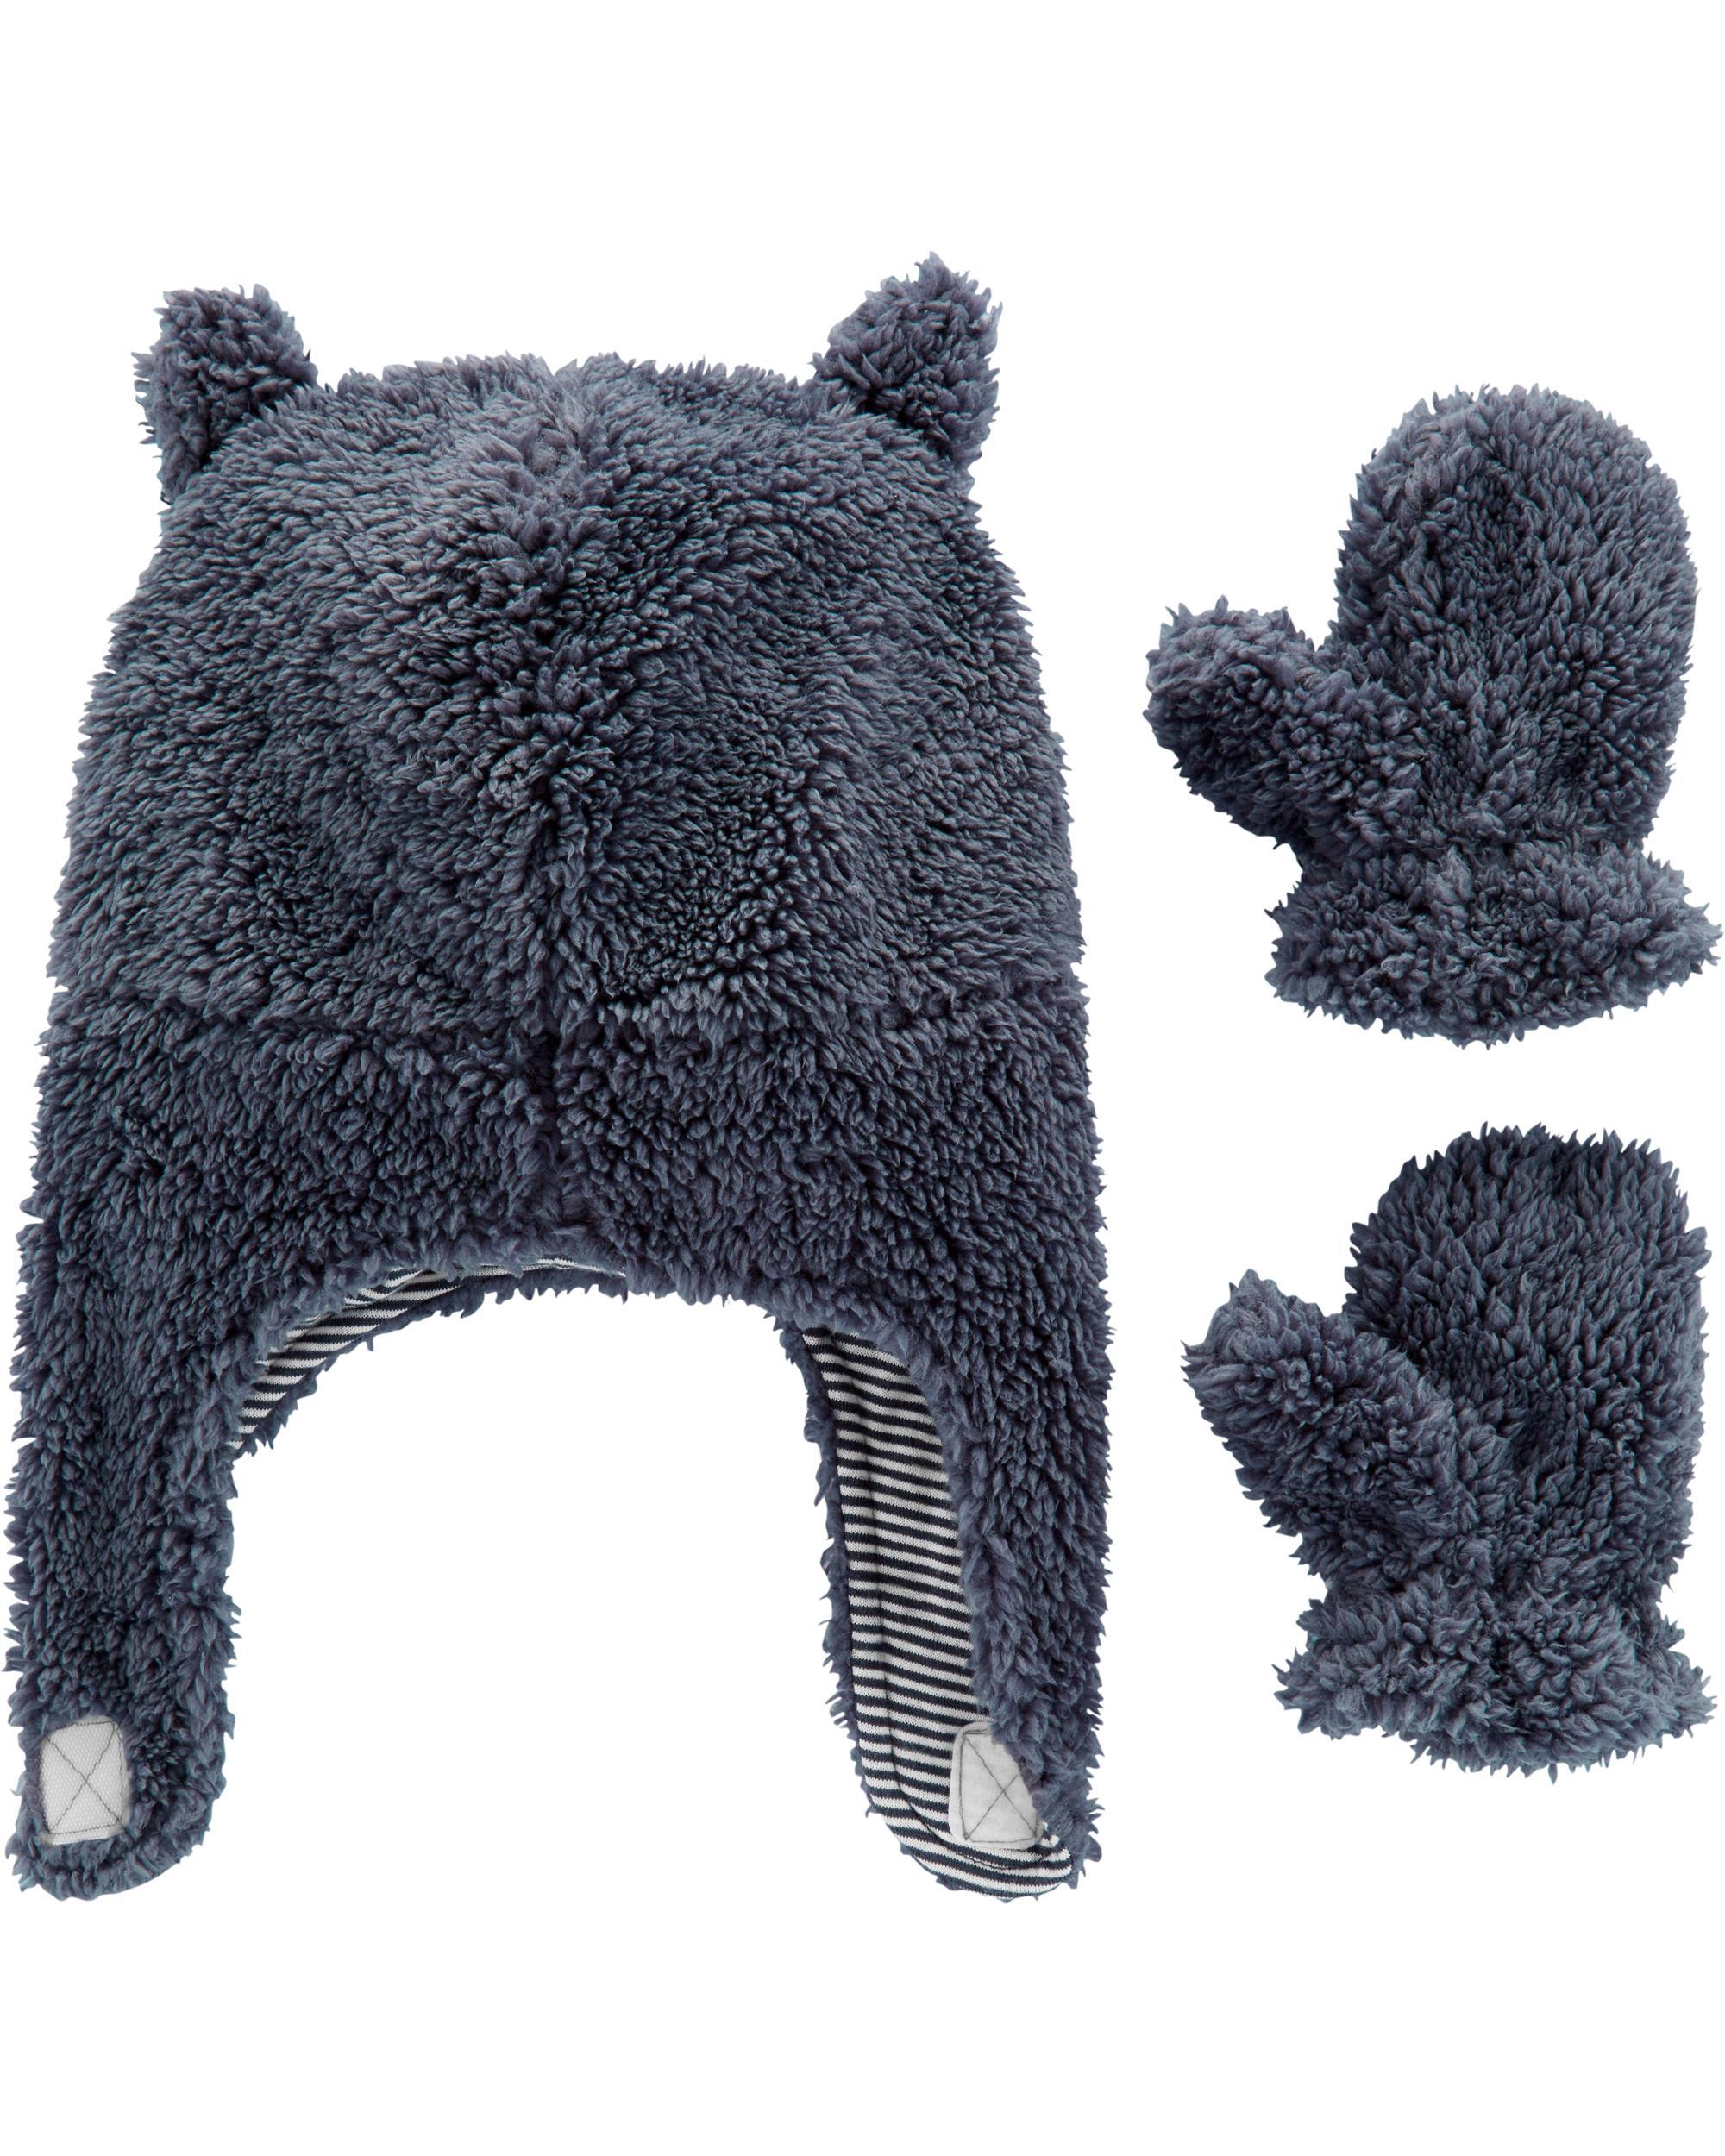 2 Piece Sherpa Hat Amp Mitten Set Oshkosh Com